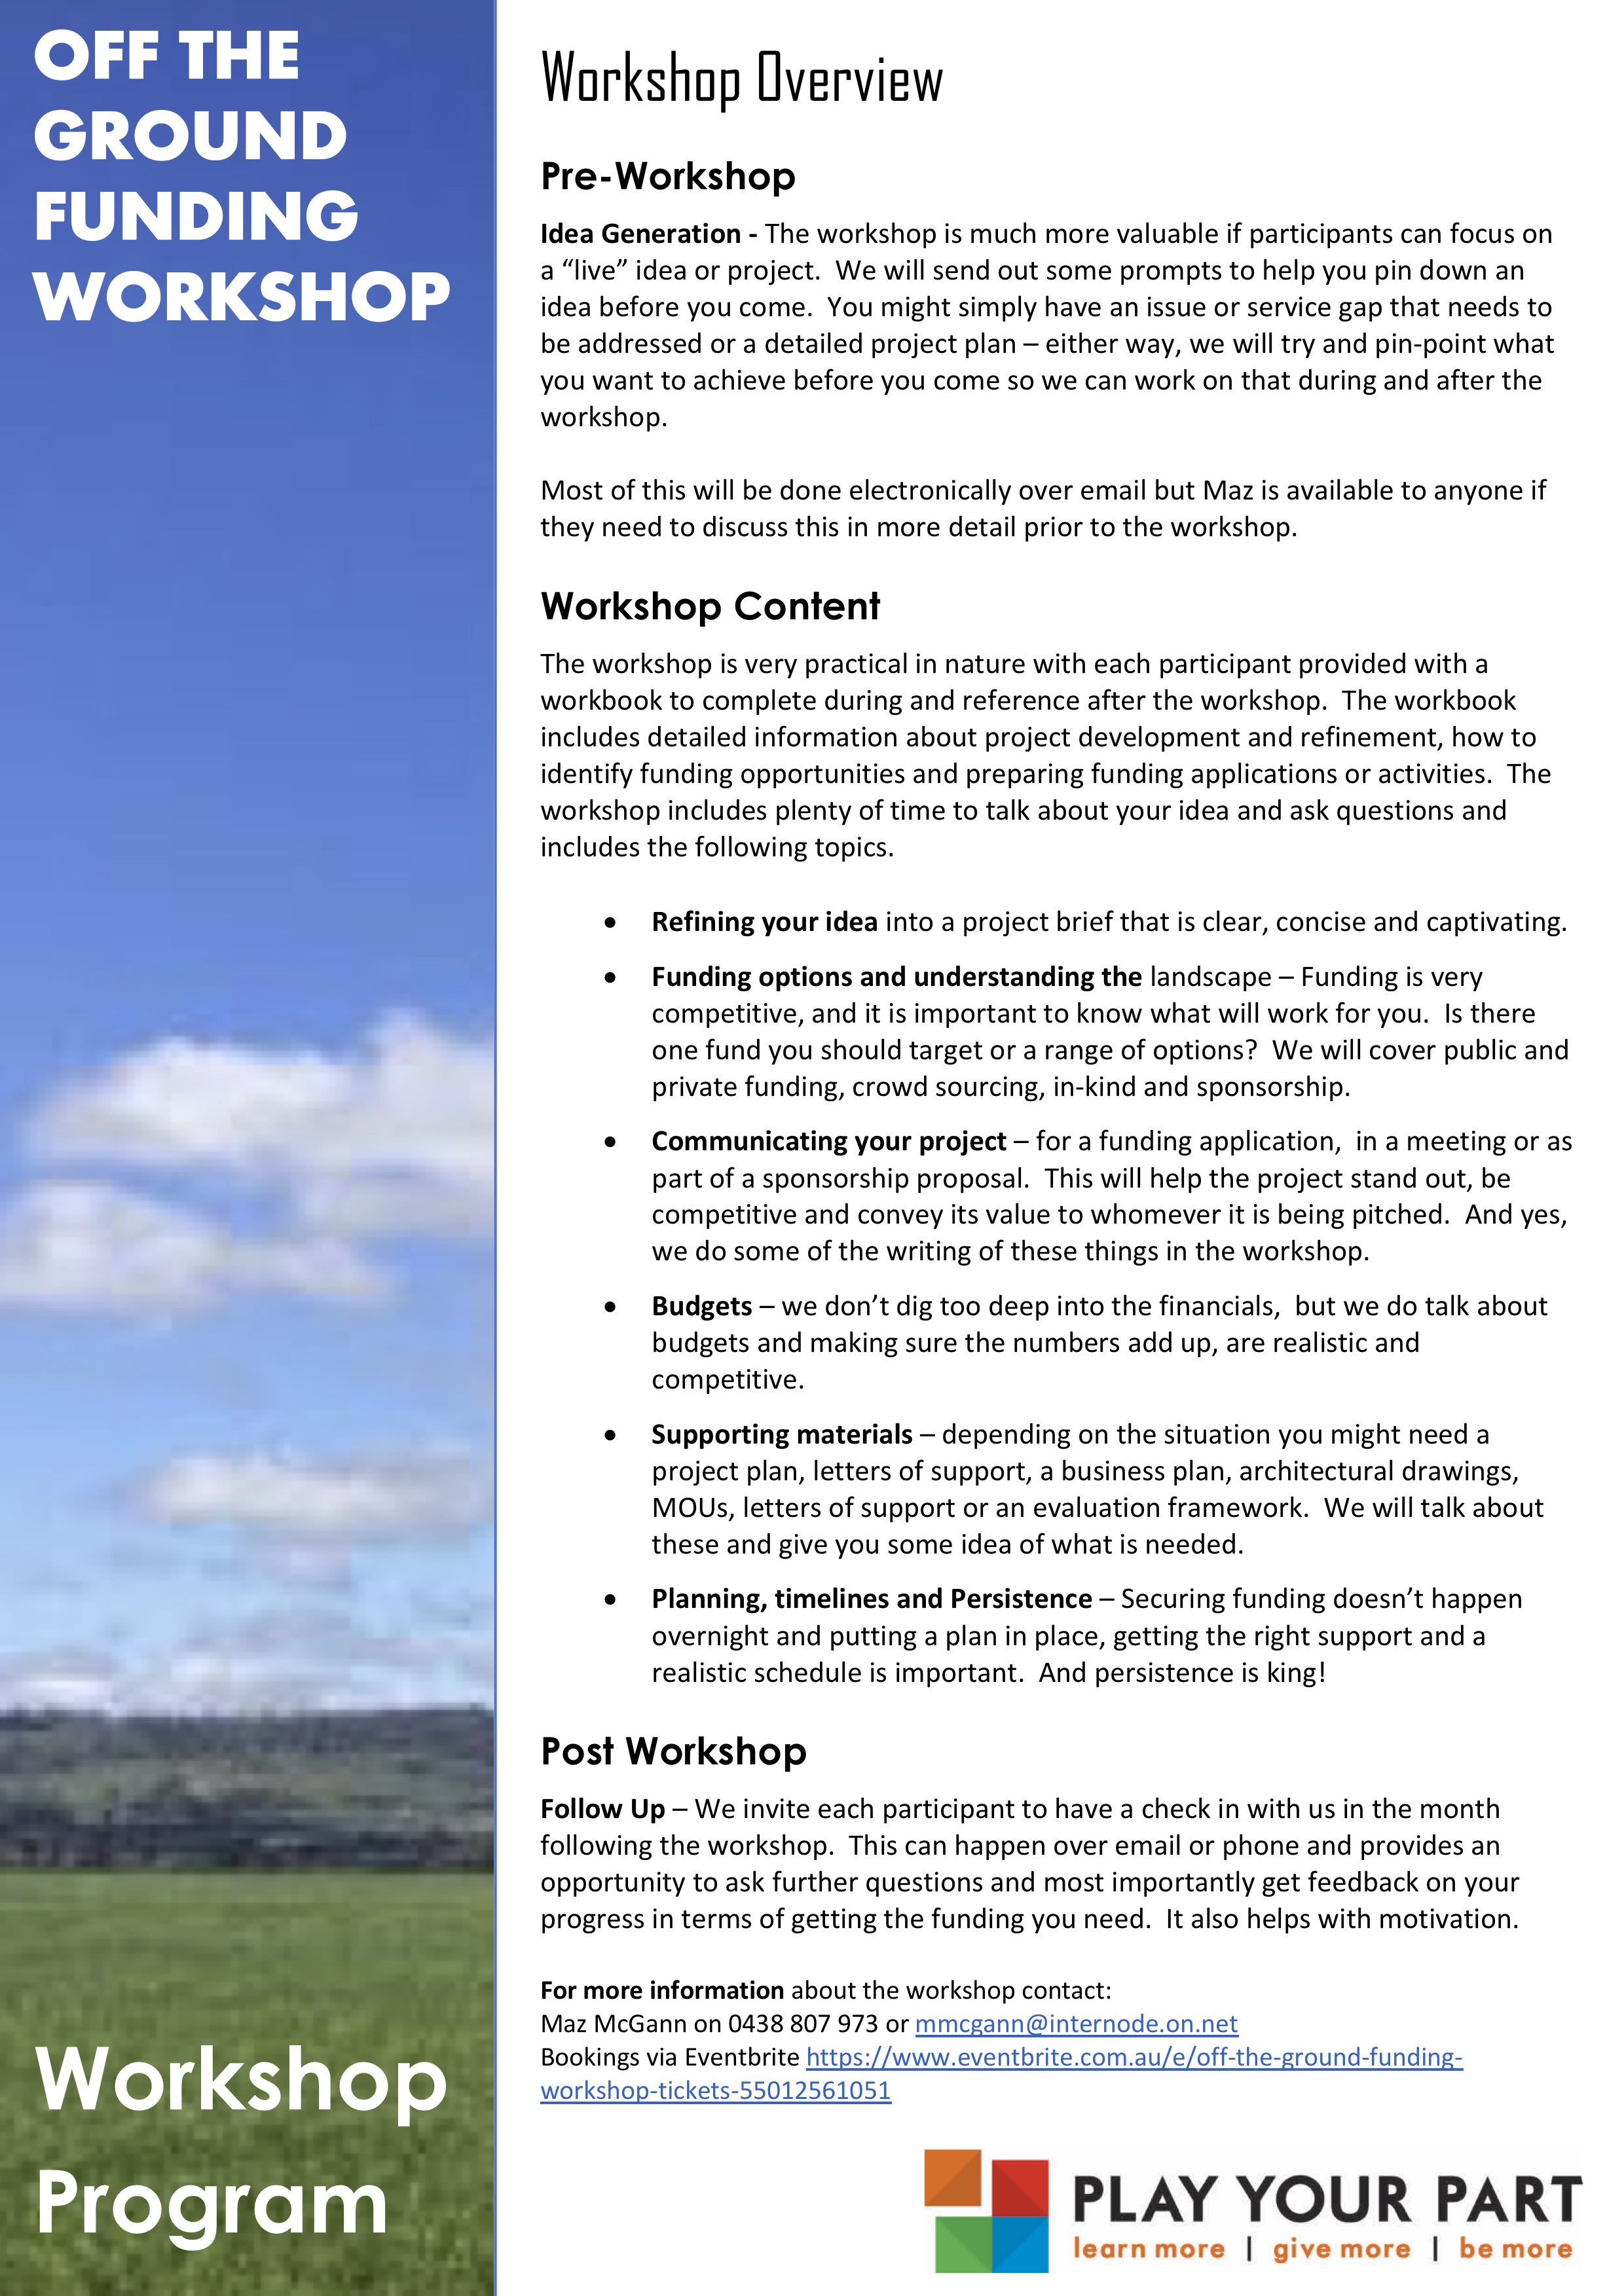 Workshop Overview - Content